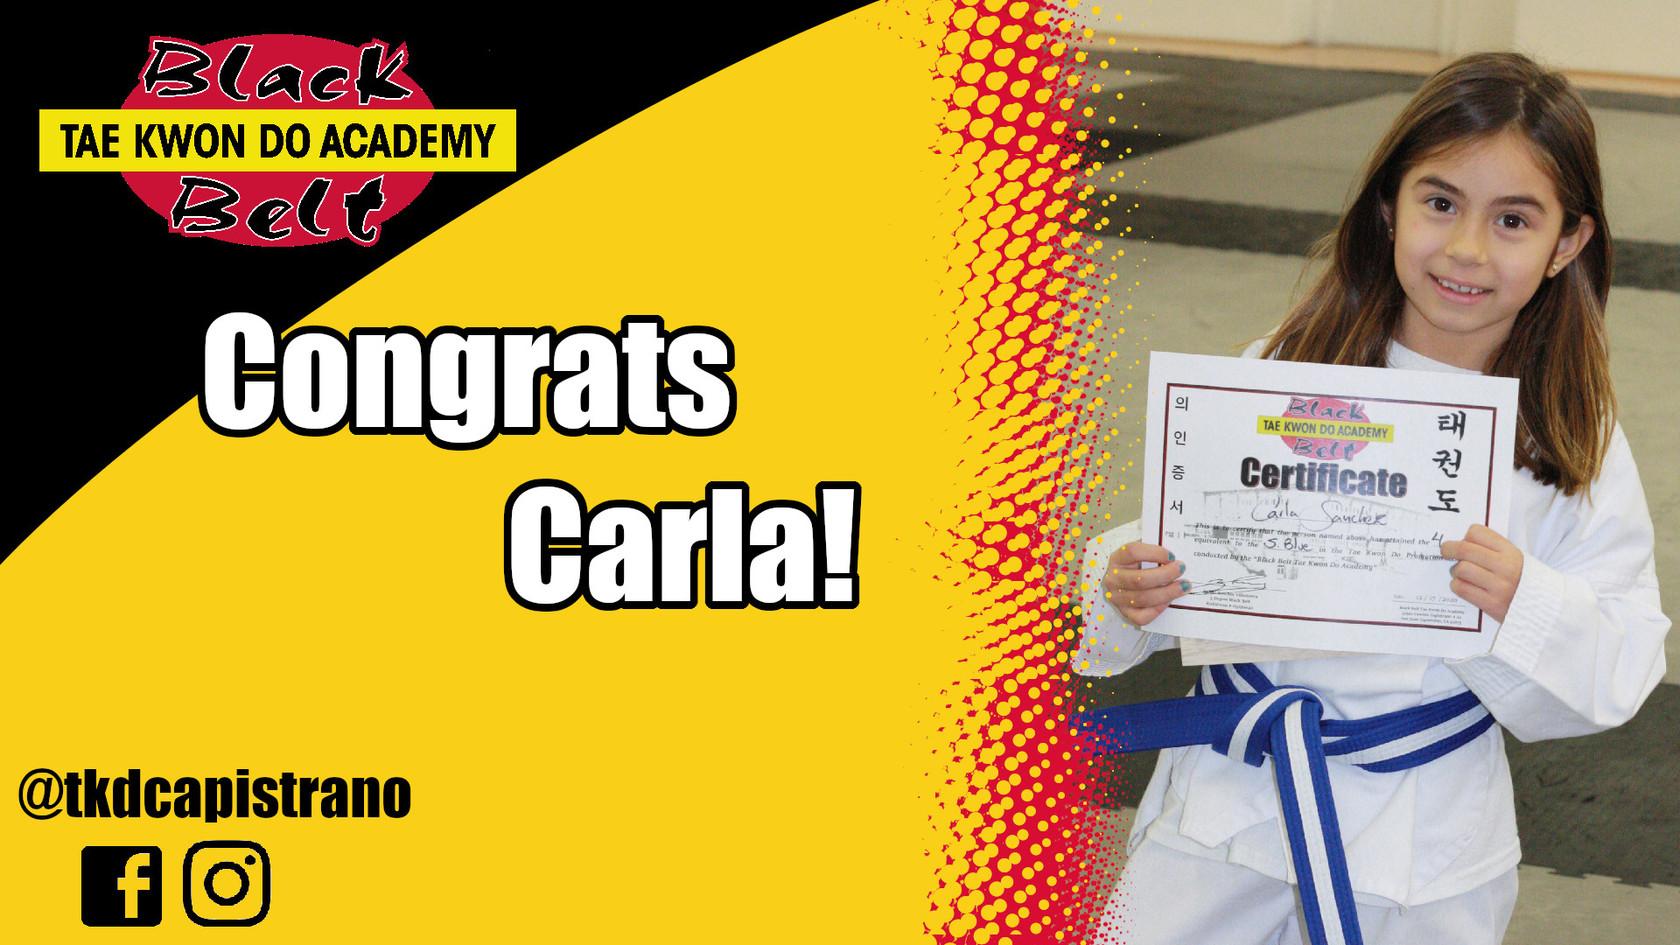 Congrats Carla!